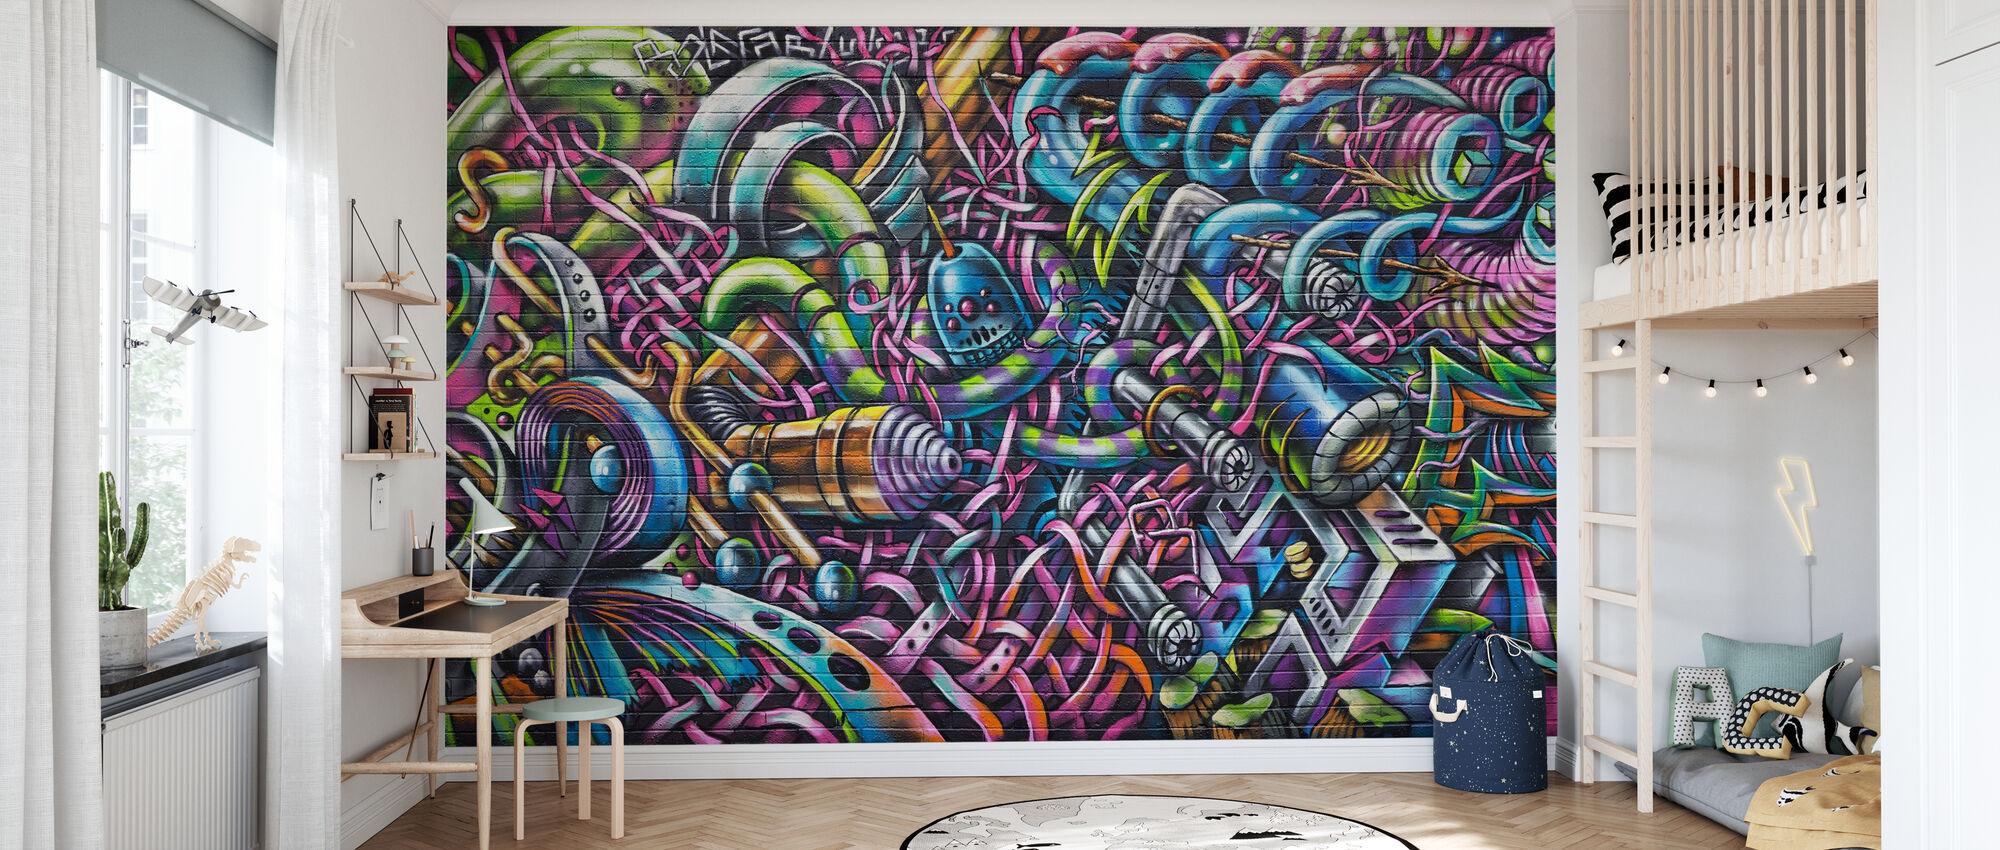 RolfCarlWerner - Wallpaper - Kids Room